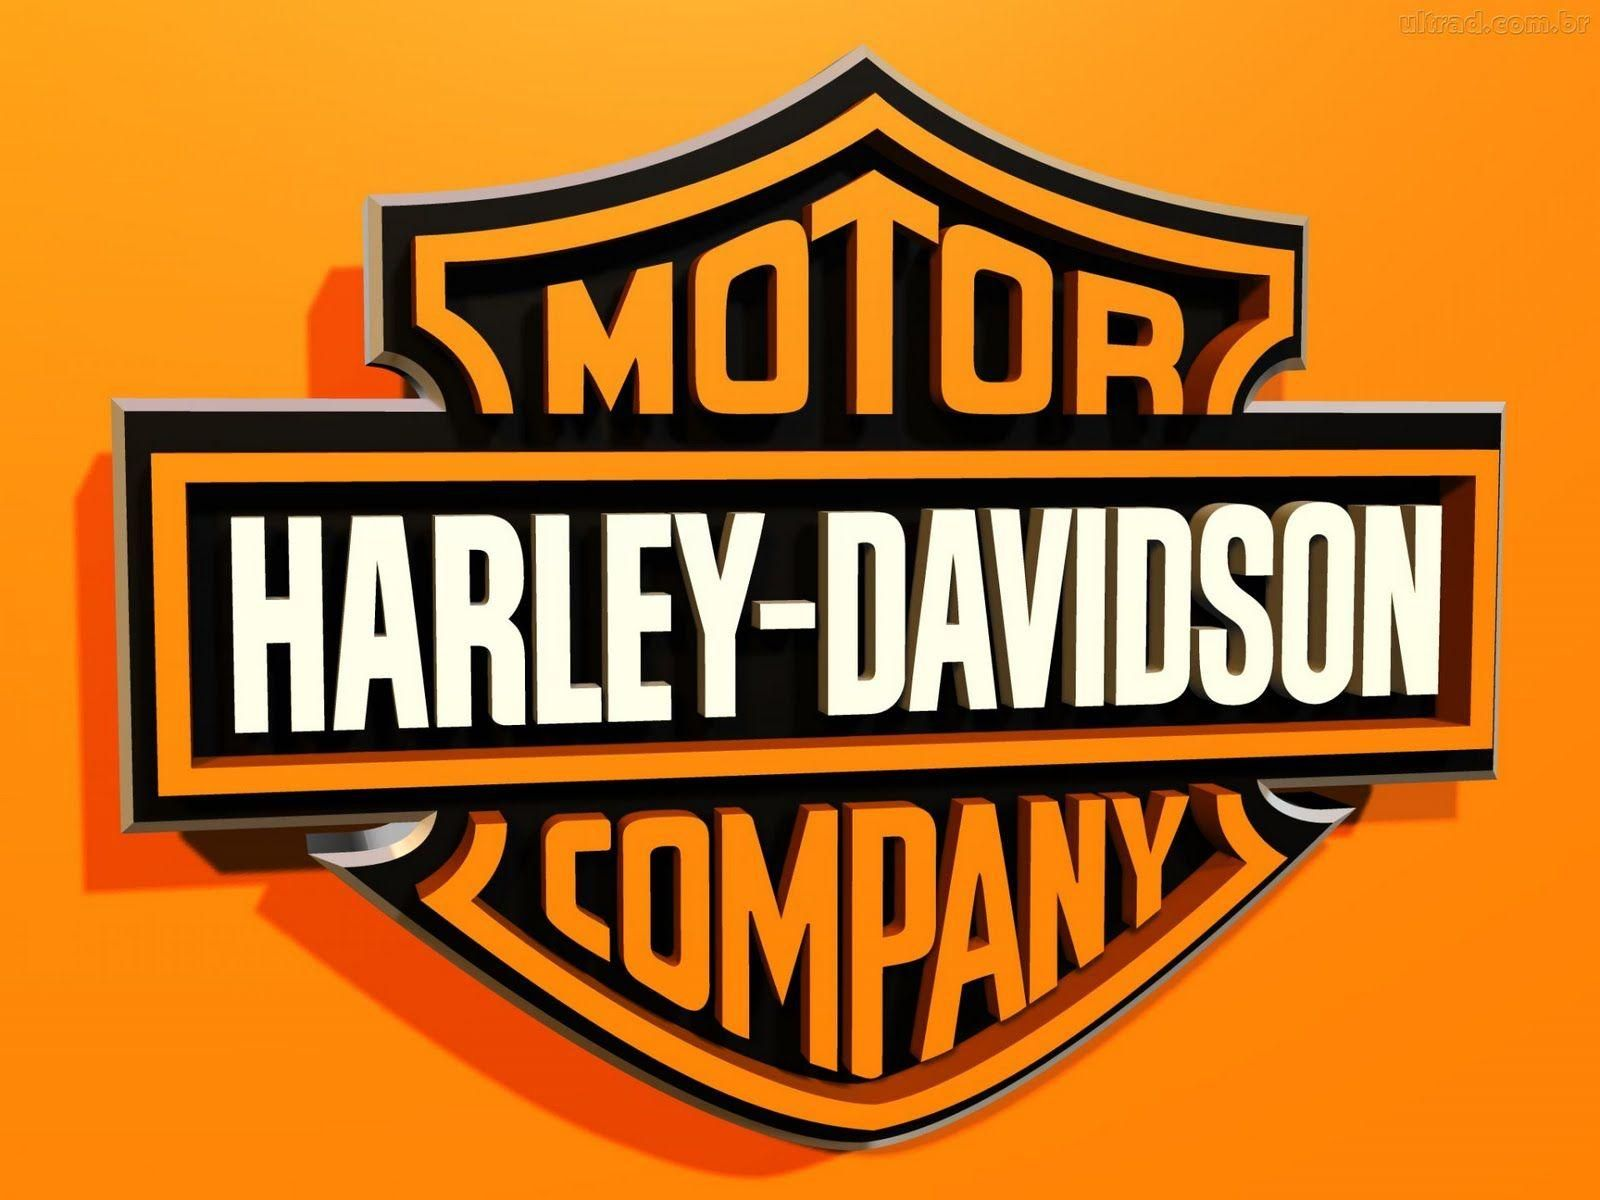 Harley Davidson Logo Wallpapers Wallpaper Cave In 2020 Harley Davidson Logo Harley Davidson Wallpaper Harley Davidson